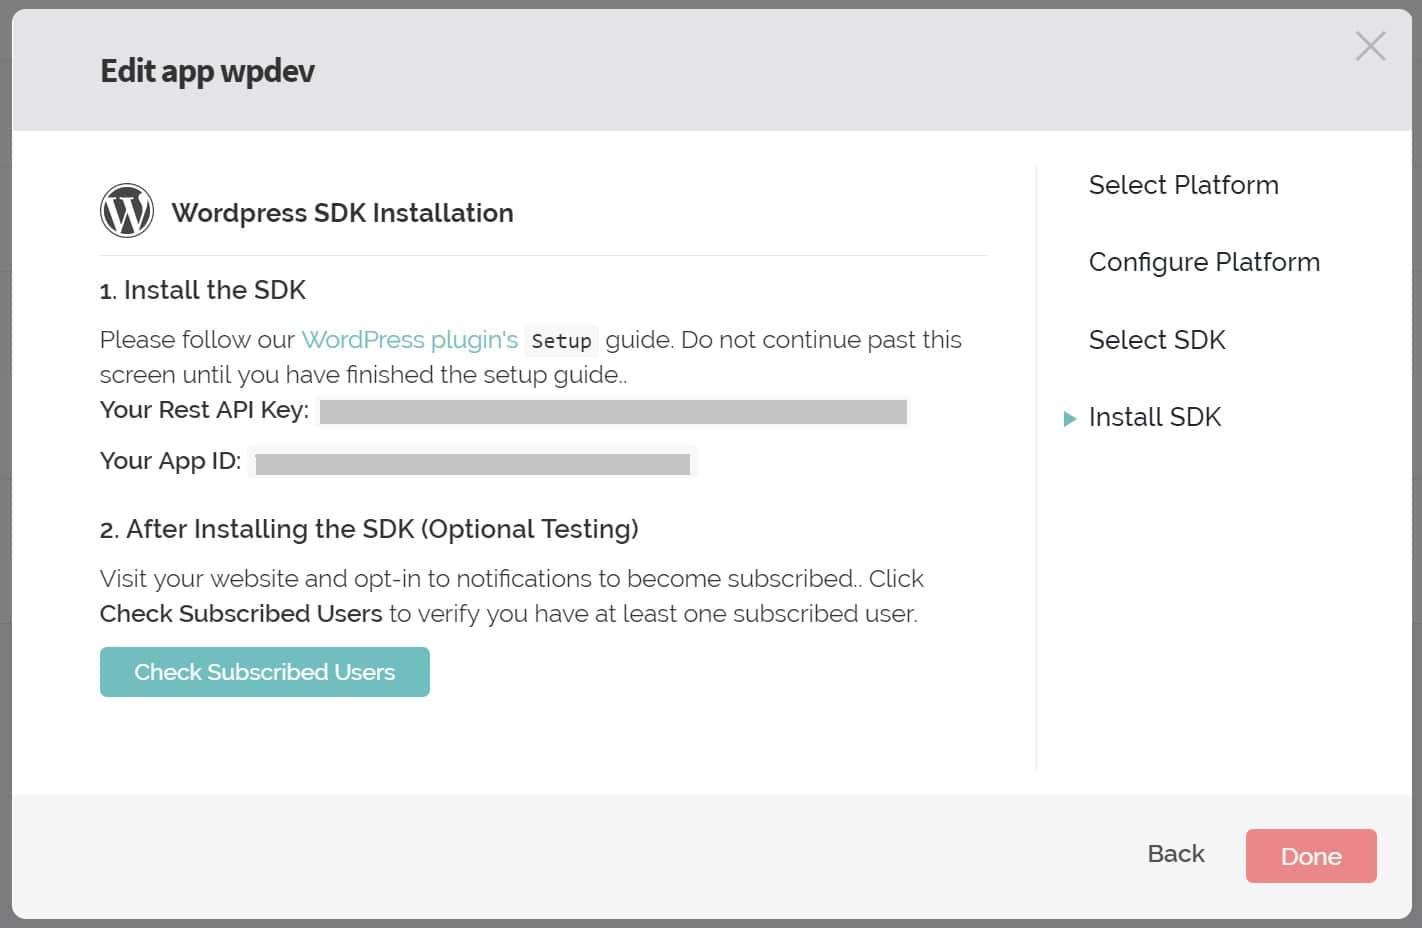 API key e App ID di OneSignal